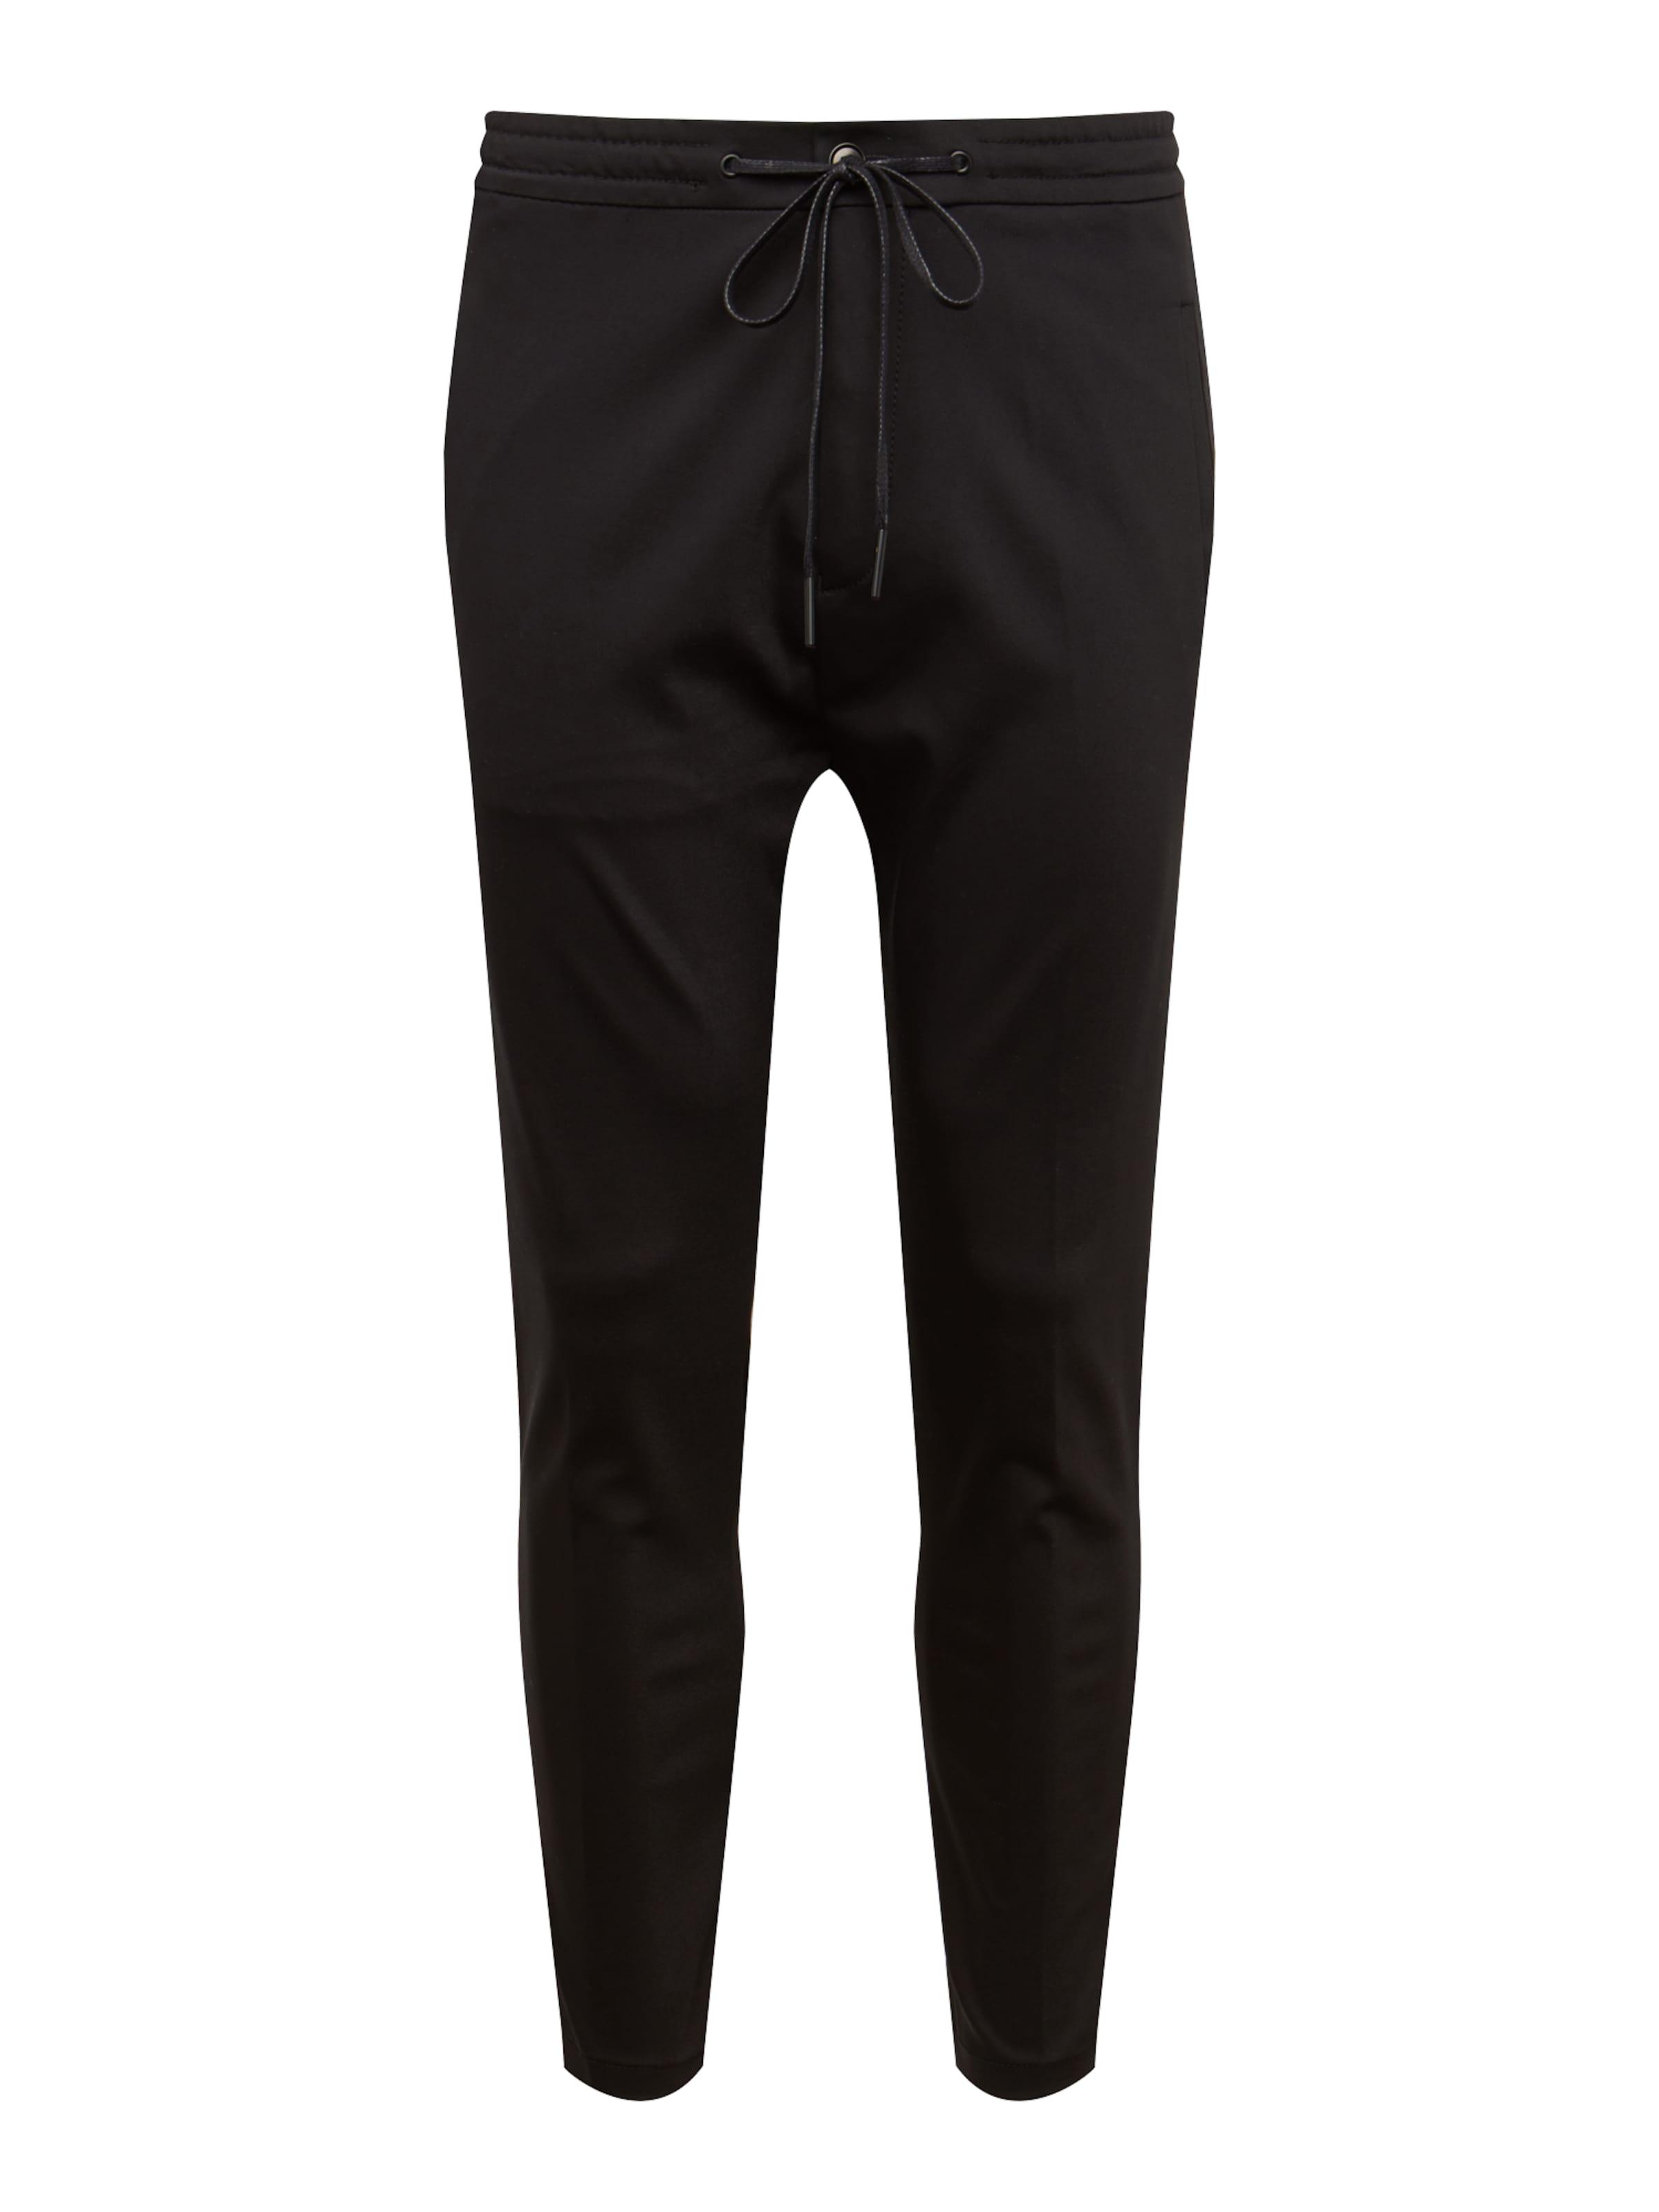 'jeger' Noir Pantalon Drykorn En bfyYg6vI7